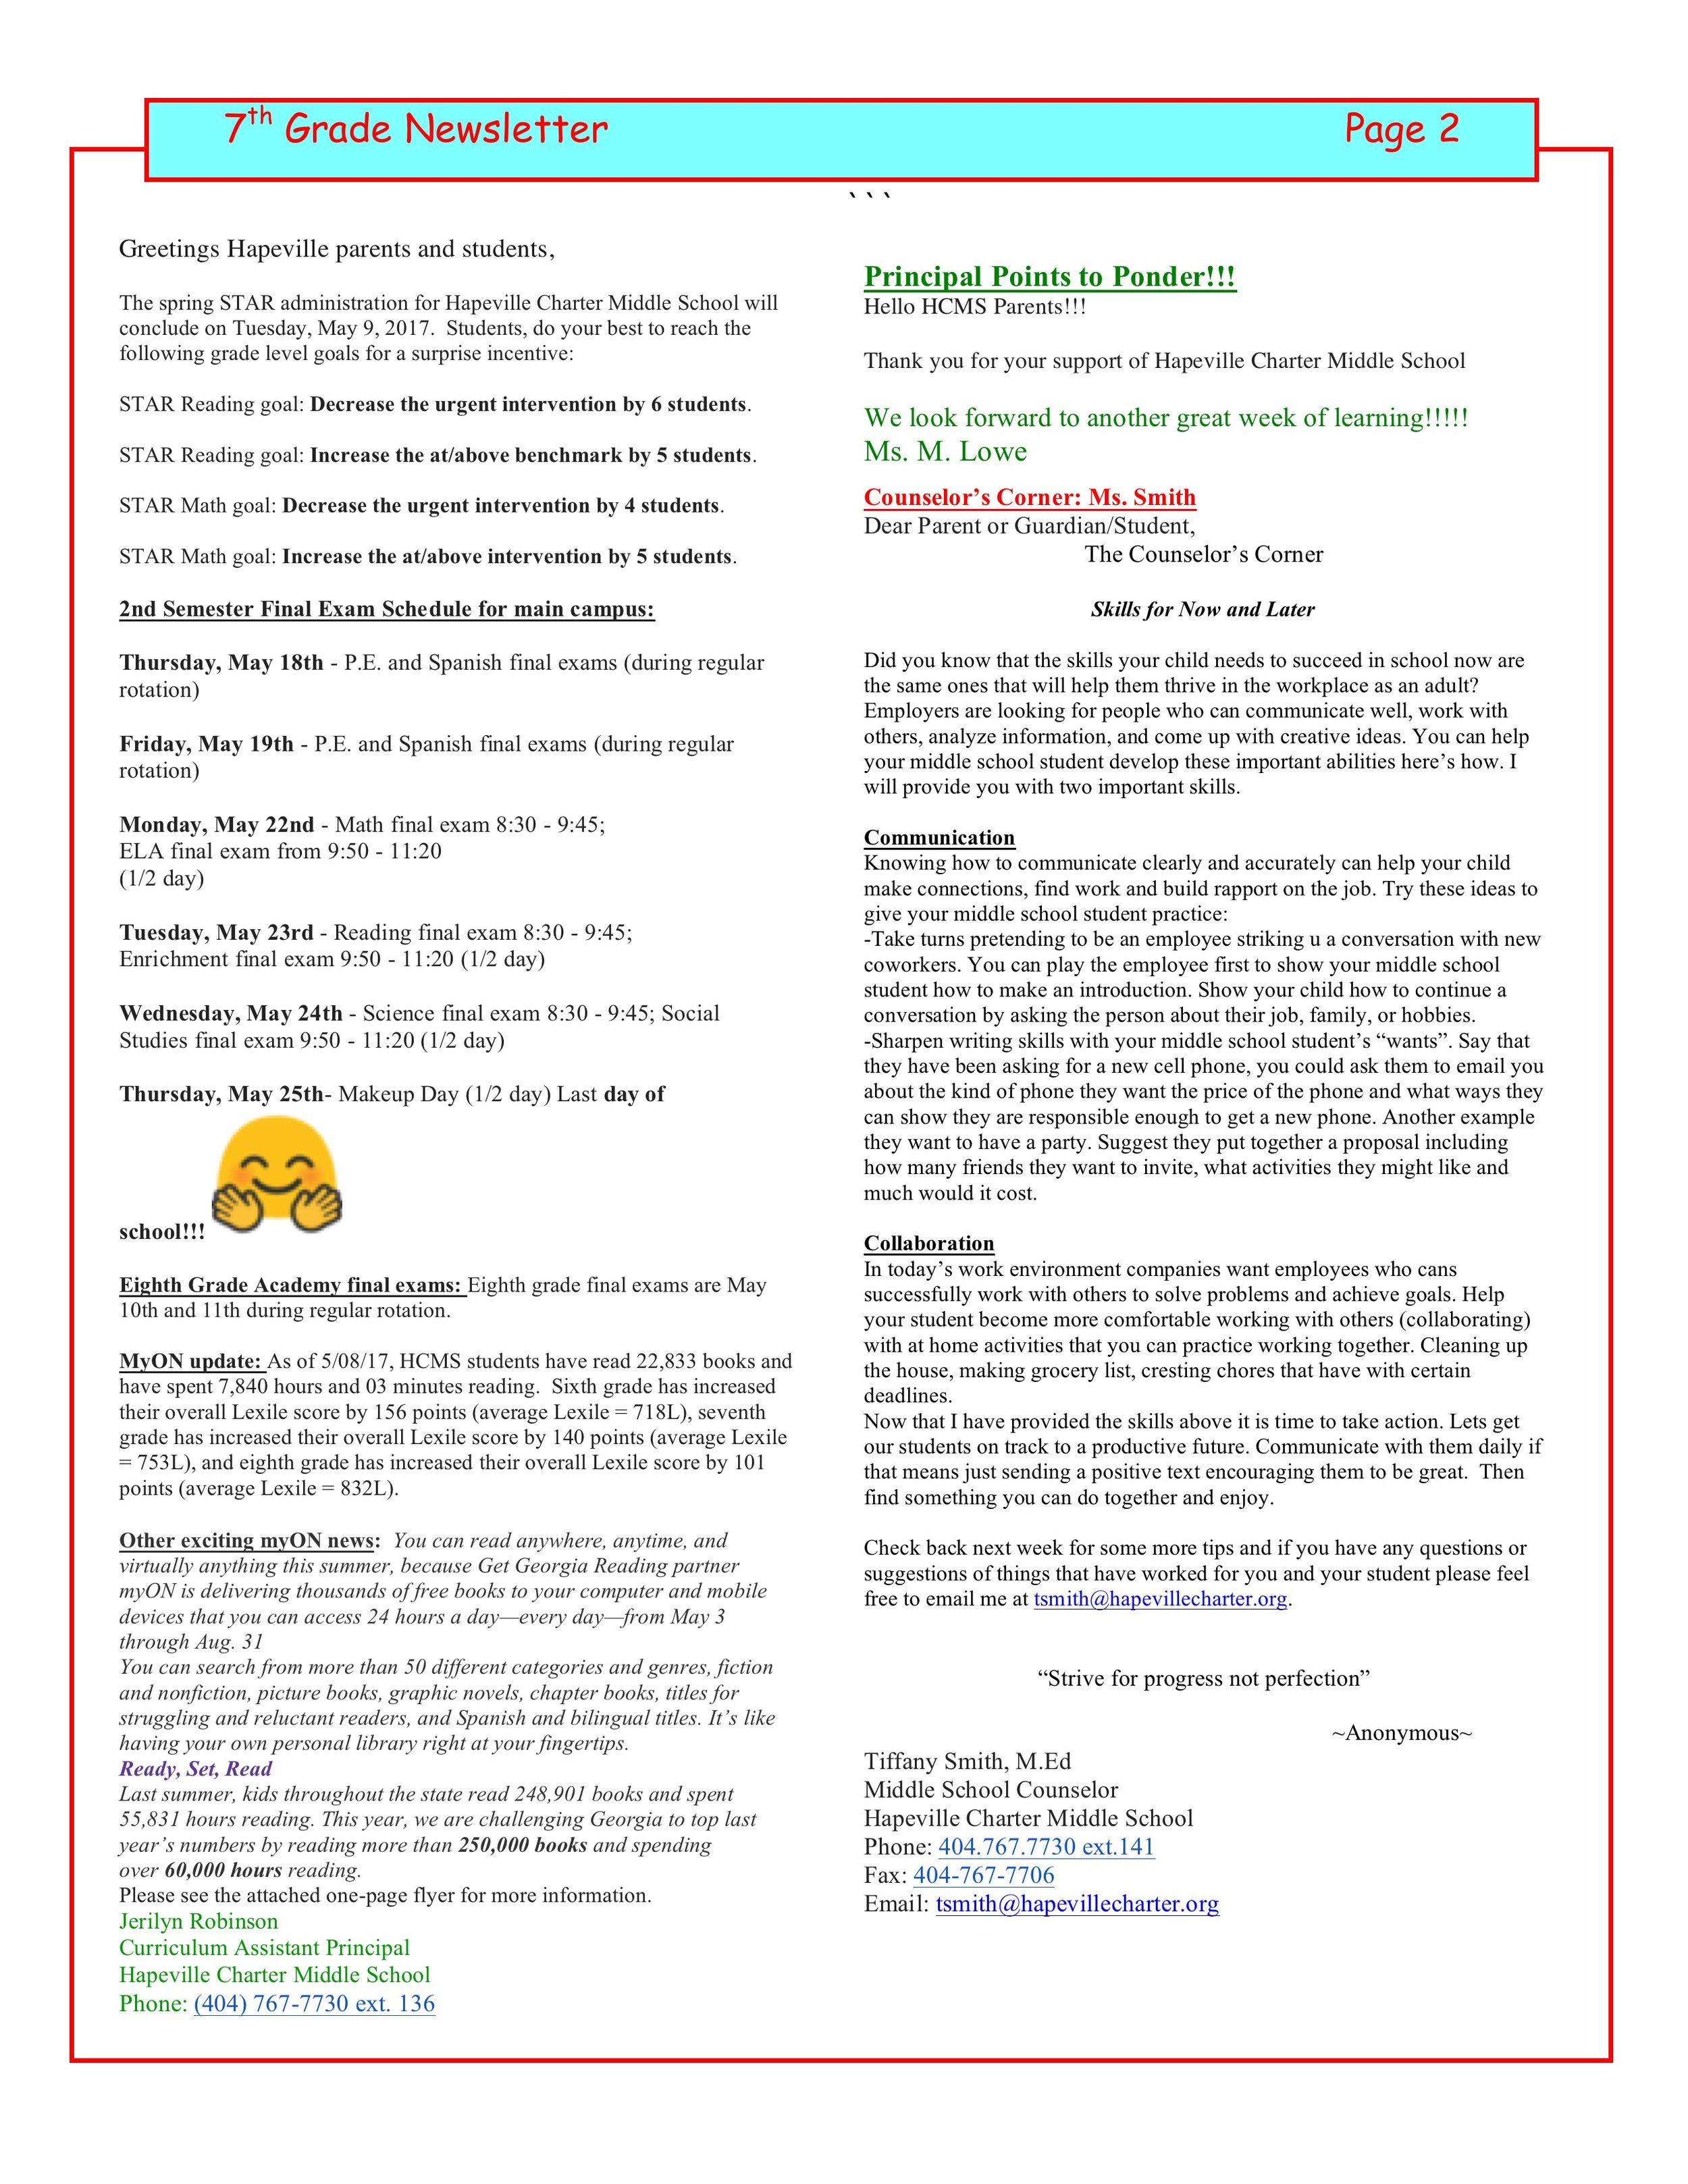 7th Grade — 7th Grade Newsletter — Hapeville Charter Middle School